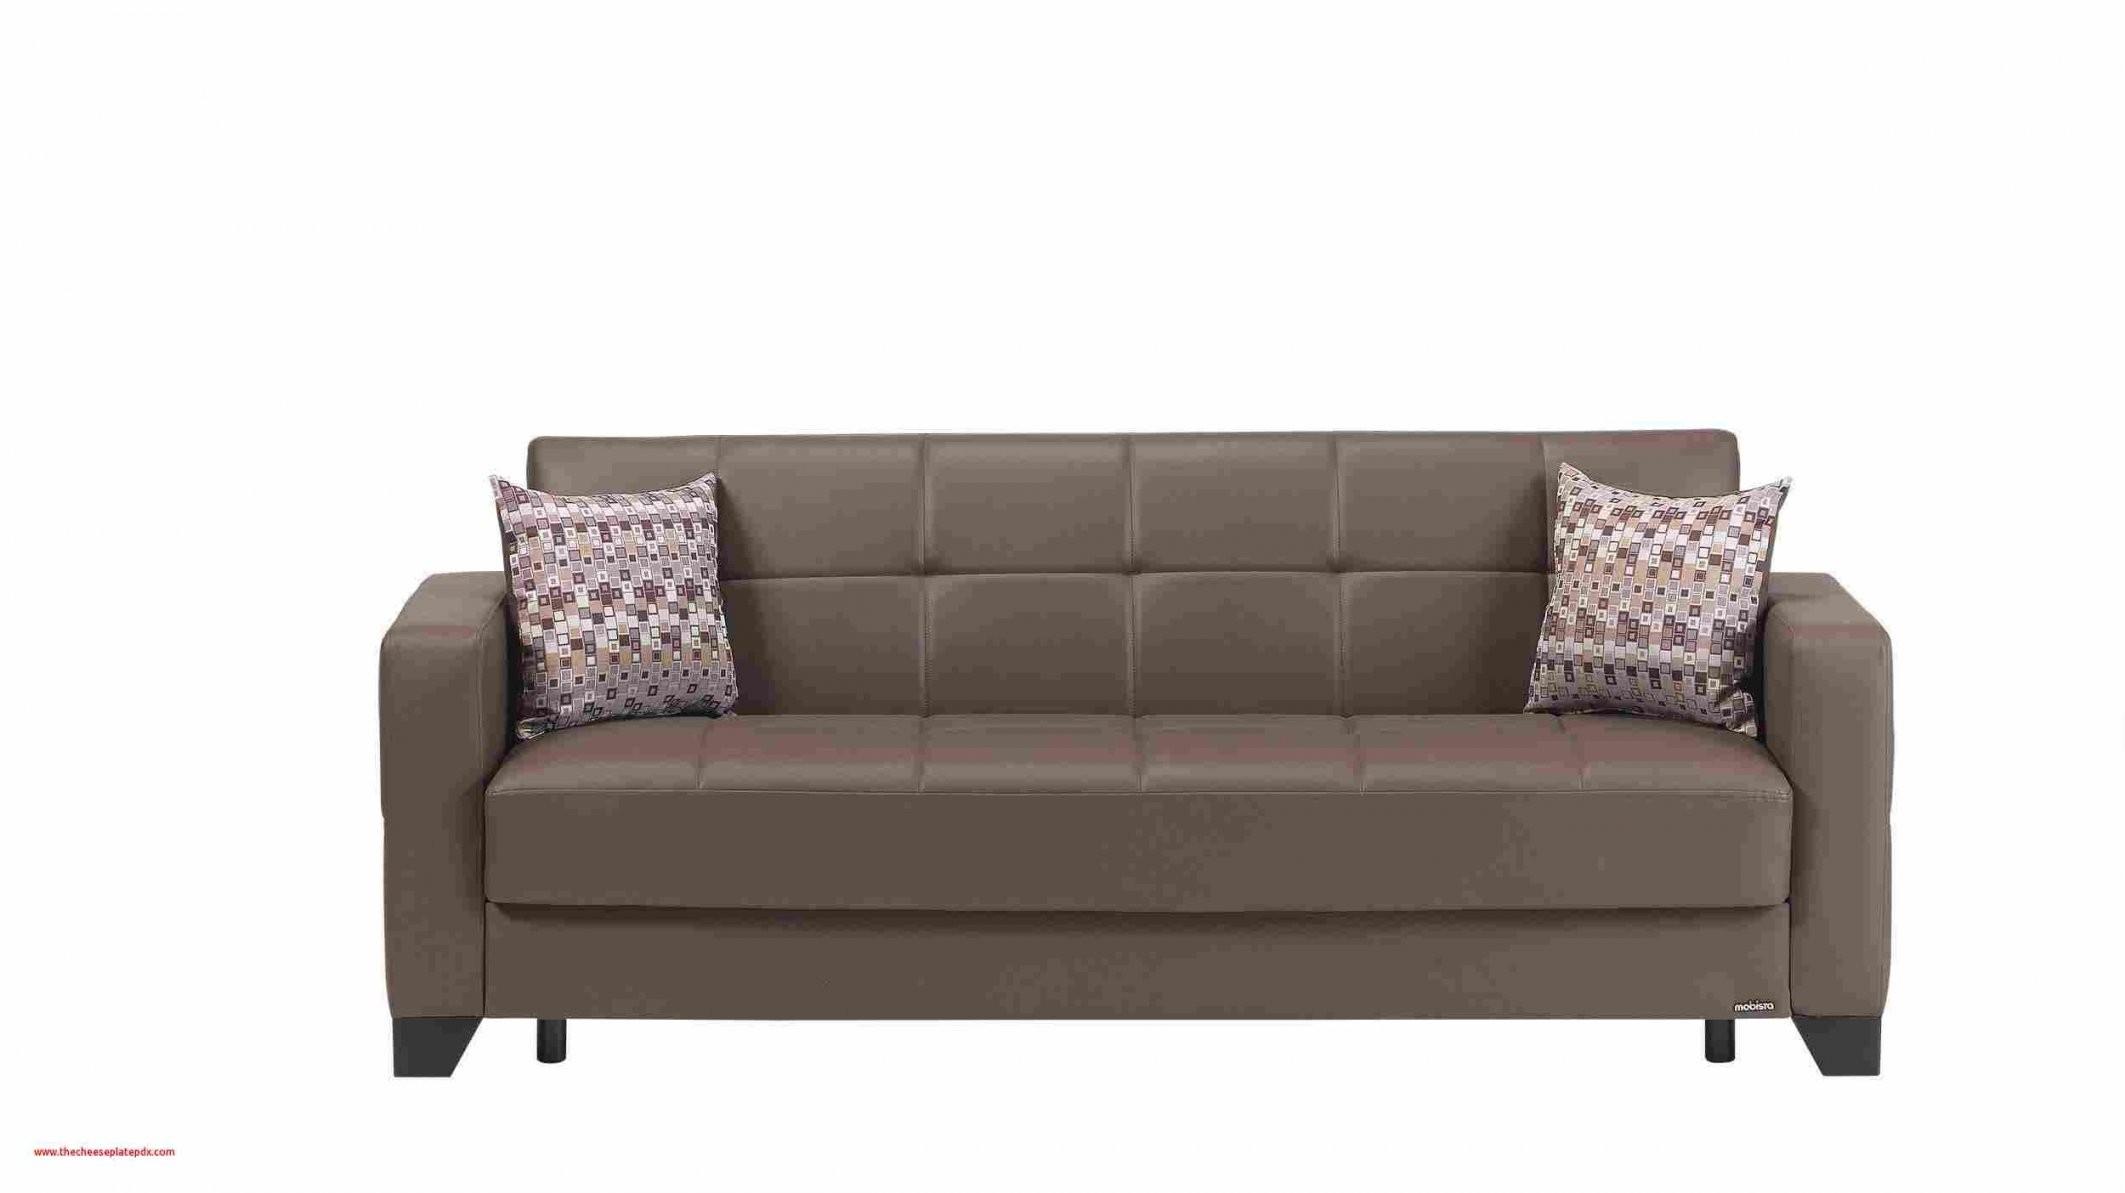 40 Elegant 3 Sitzer Sofa Mit Bettfunktion  Akibainc  Akibainc von 3 Sitzer Sofa Mit Bettfunktion Photo